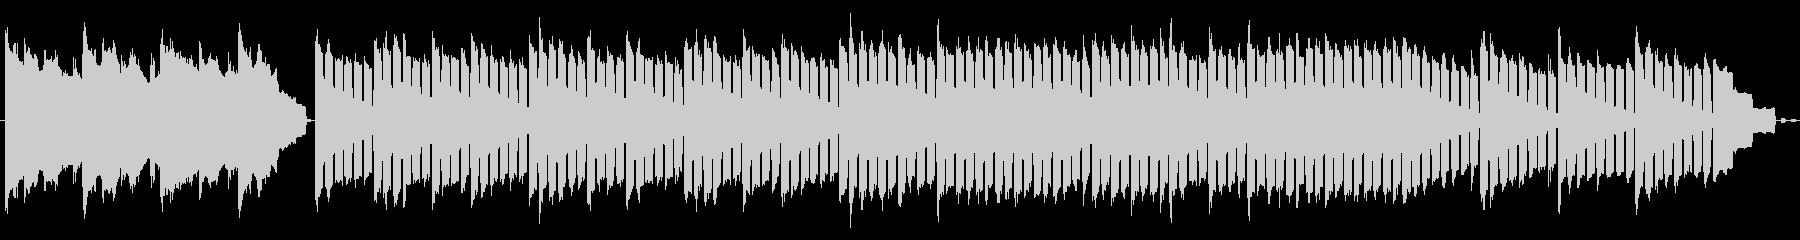 GB風アクションゲームのED曲の未再生の波形